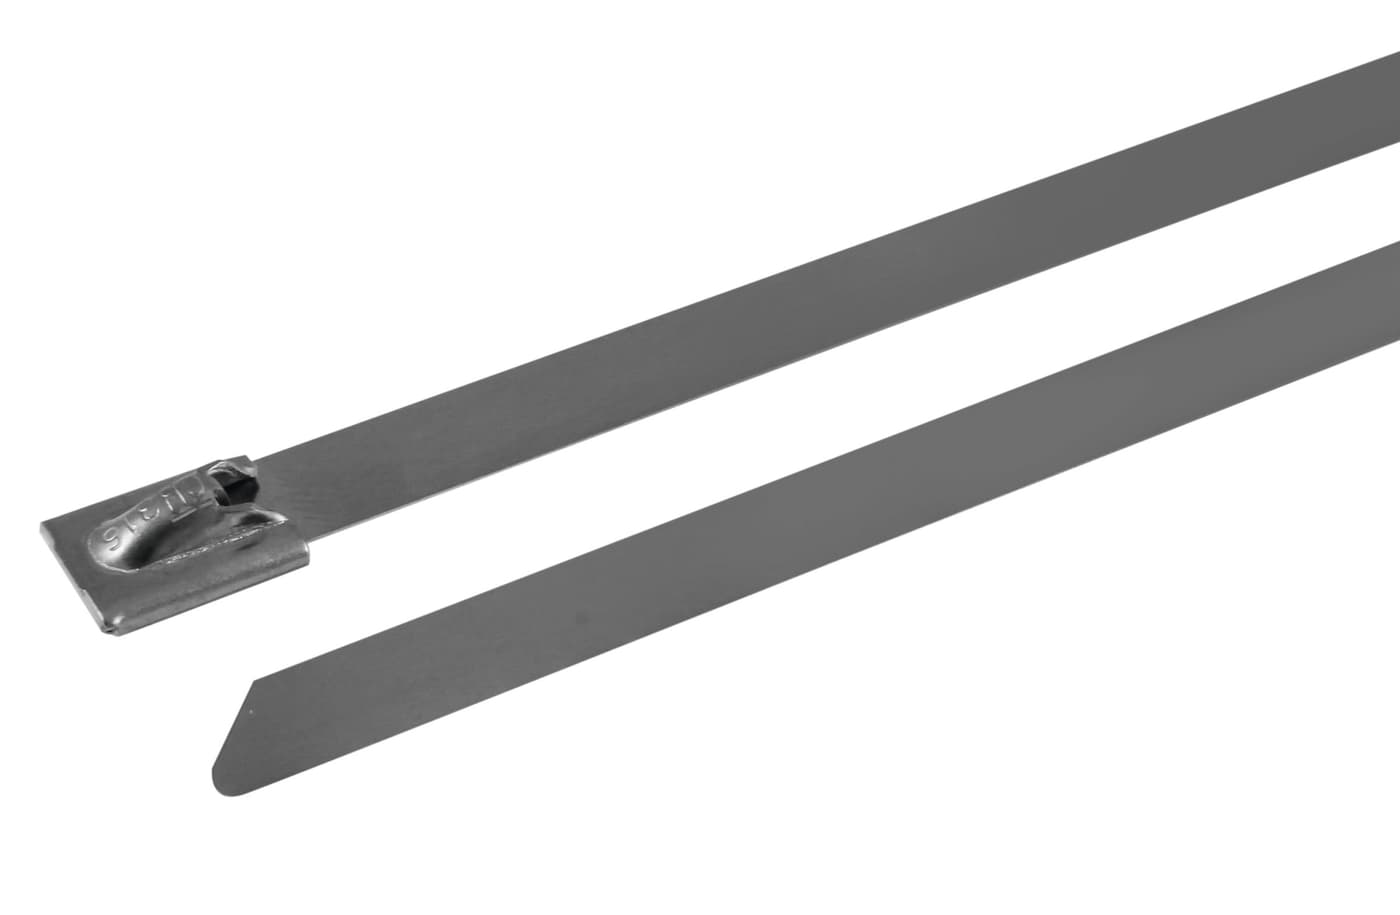 Do it + Garden Metall Kabelbinder INOX 152 mm 10 Stk. | Migros